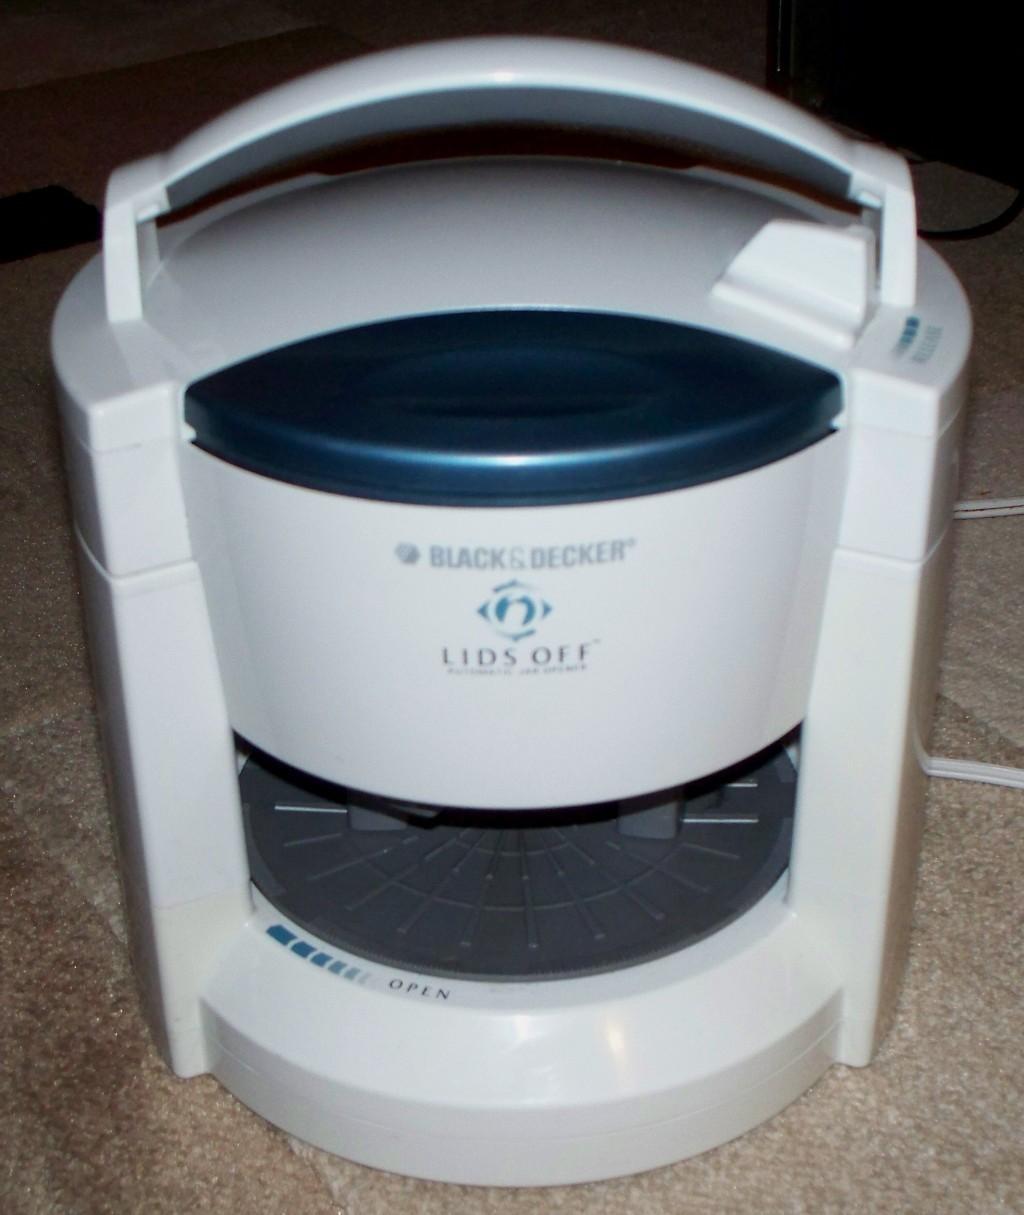 Black decker lids off automatic electric jar opener w